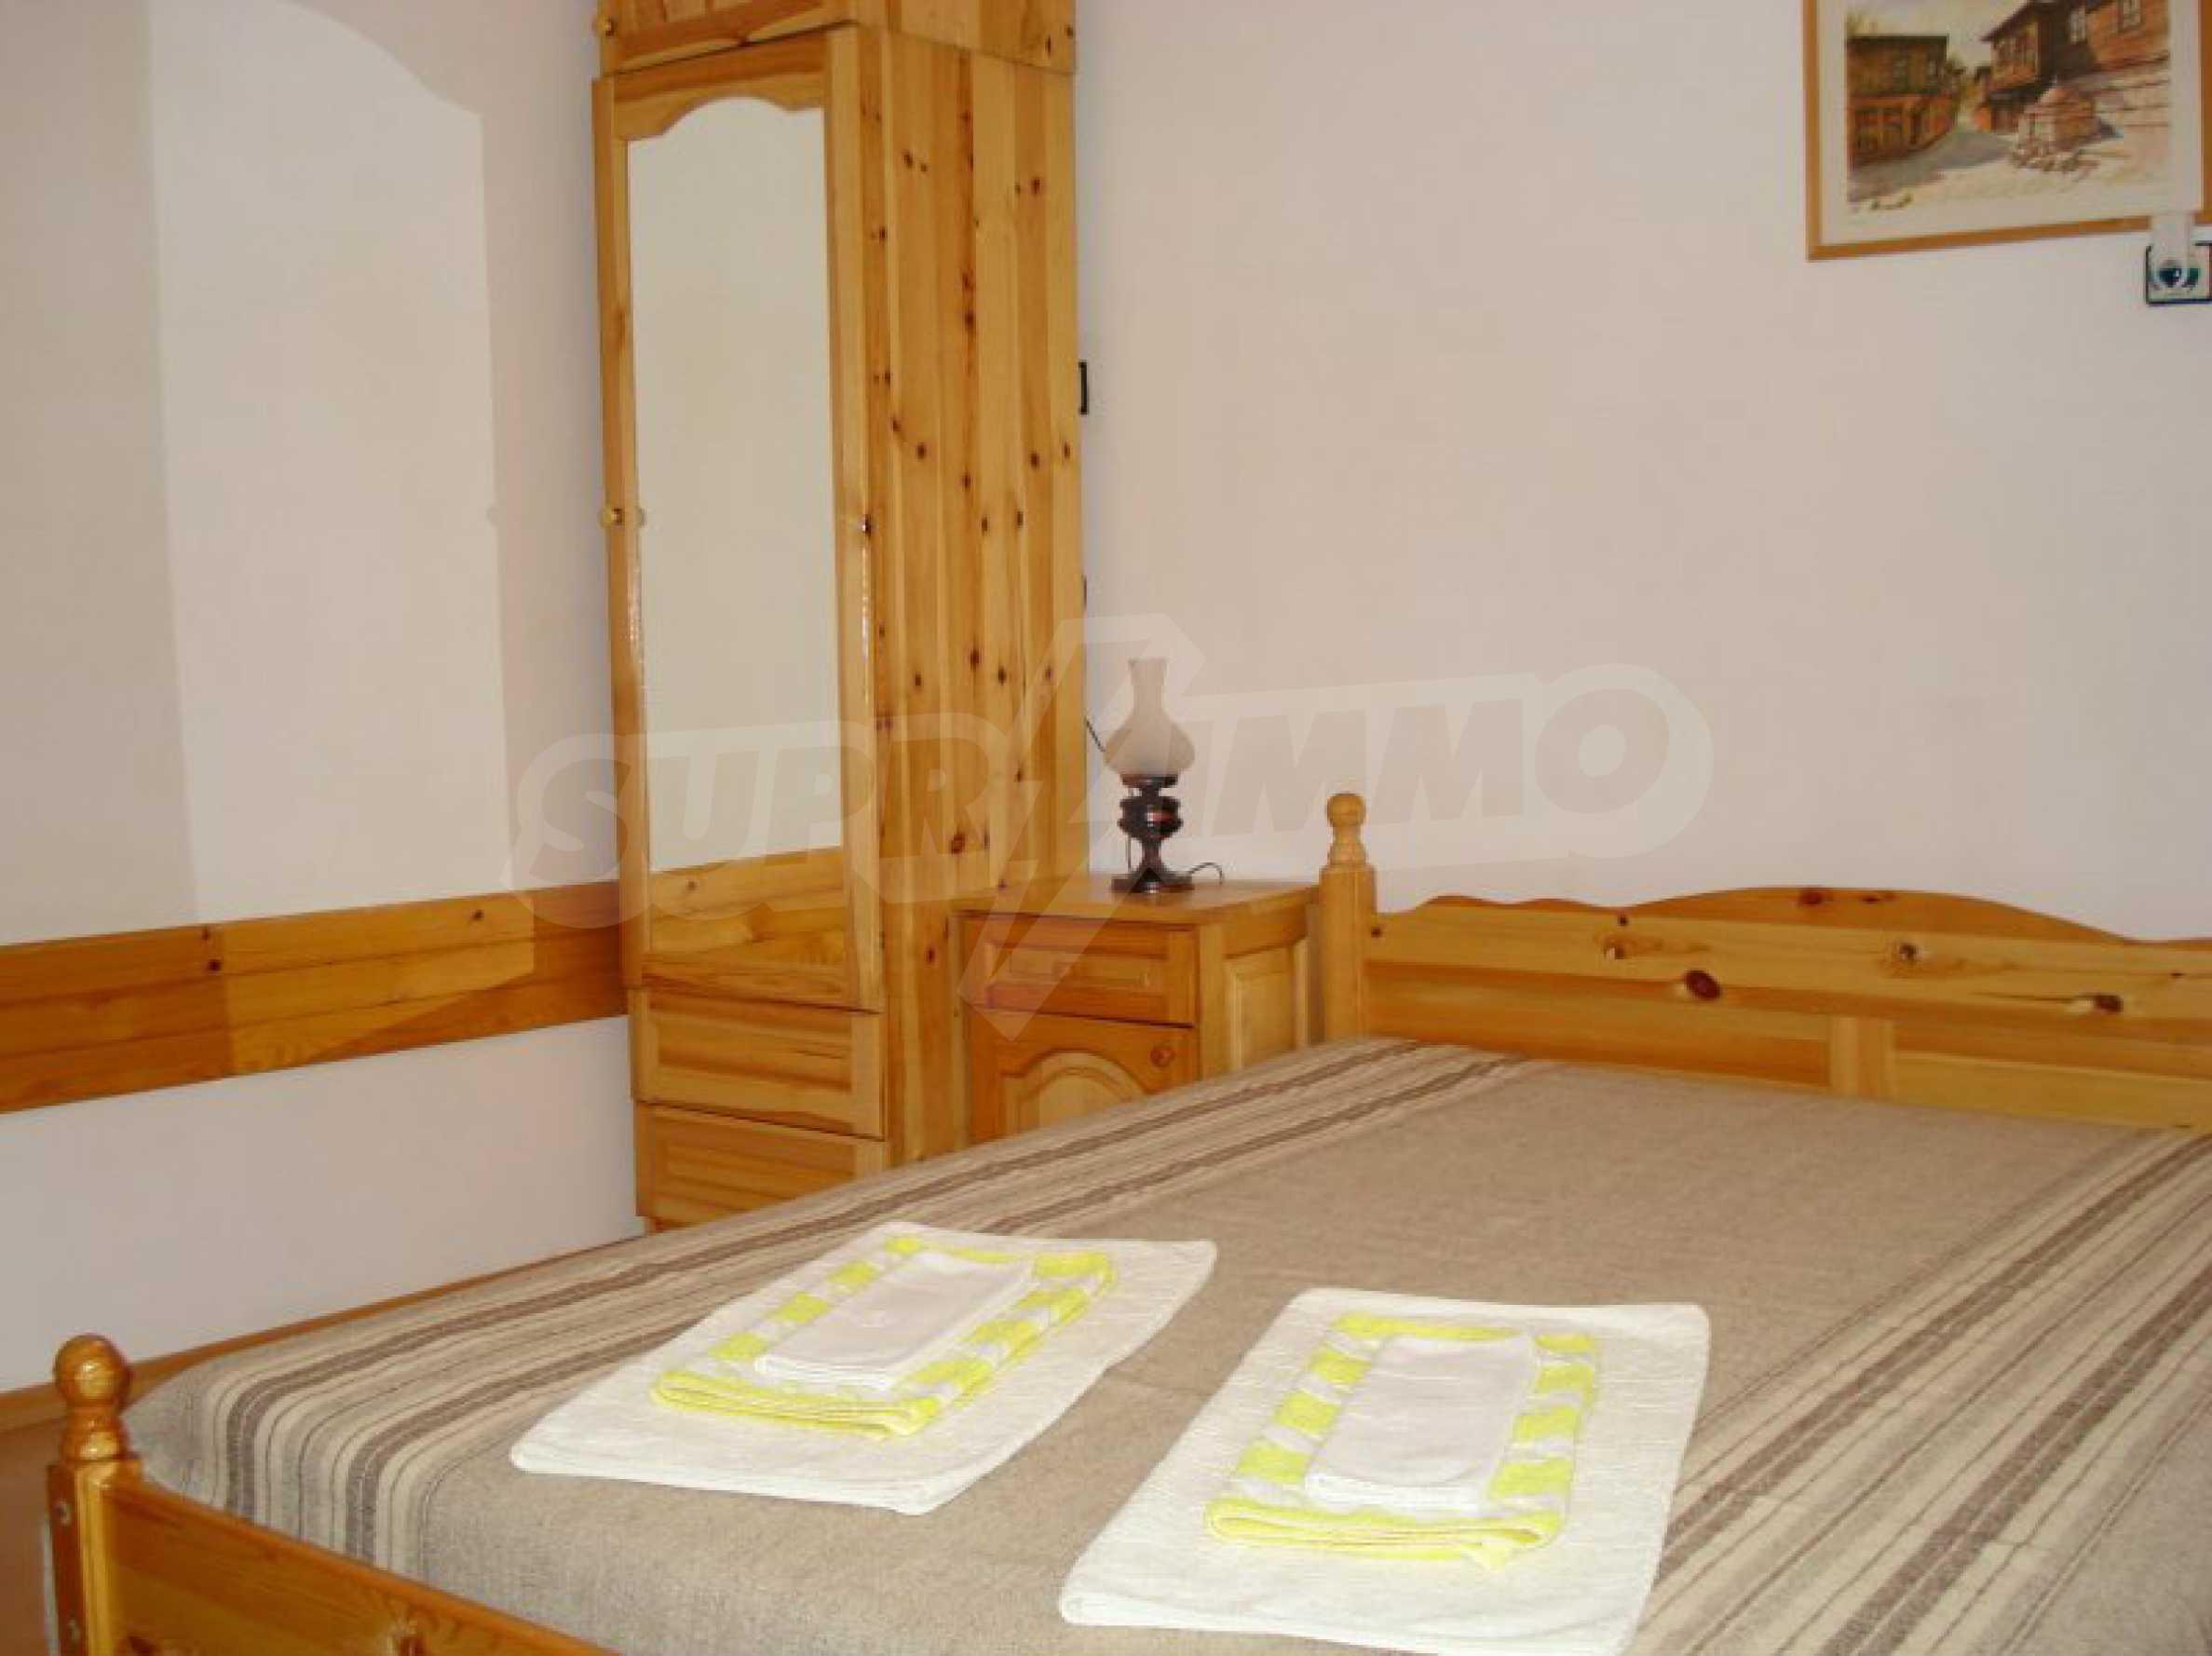 Hotelanlage mit Restaurant am Ufer des Flusses Osam in Lovech 27